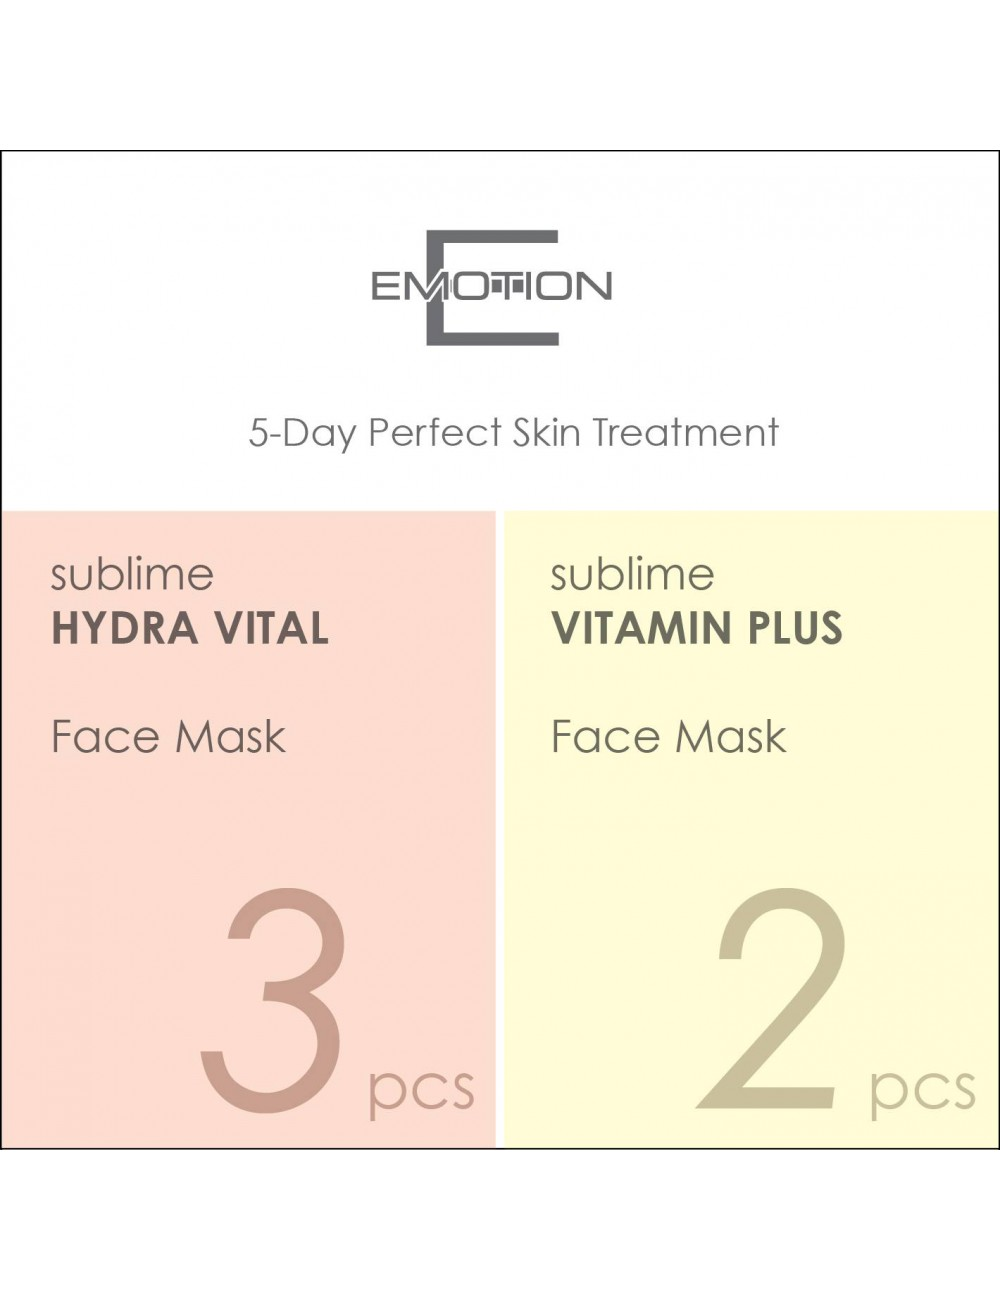 Emotion 5-Day Perfect Skin Treatment Mask (5 pcs)